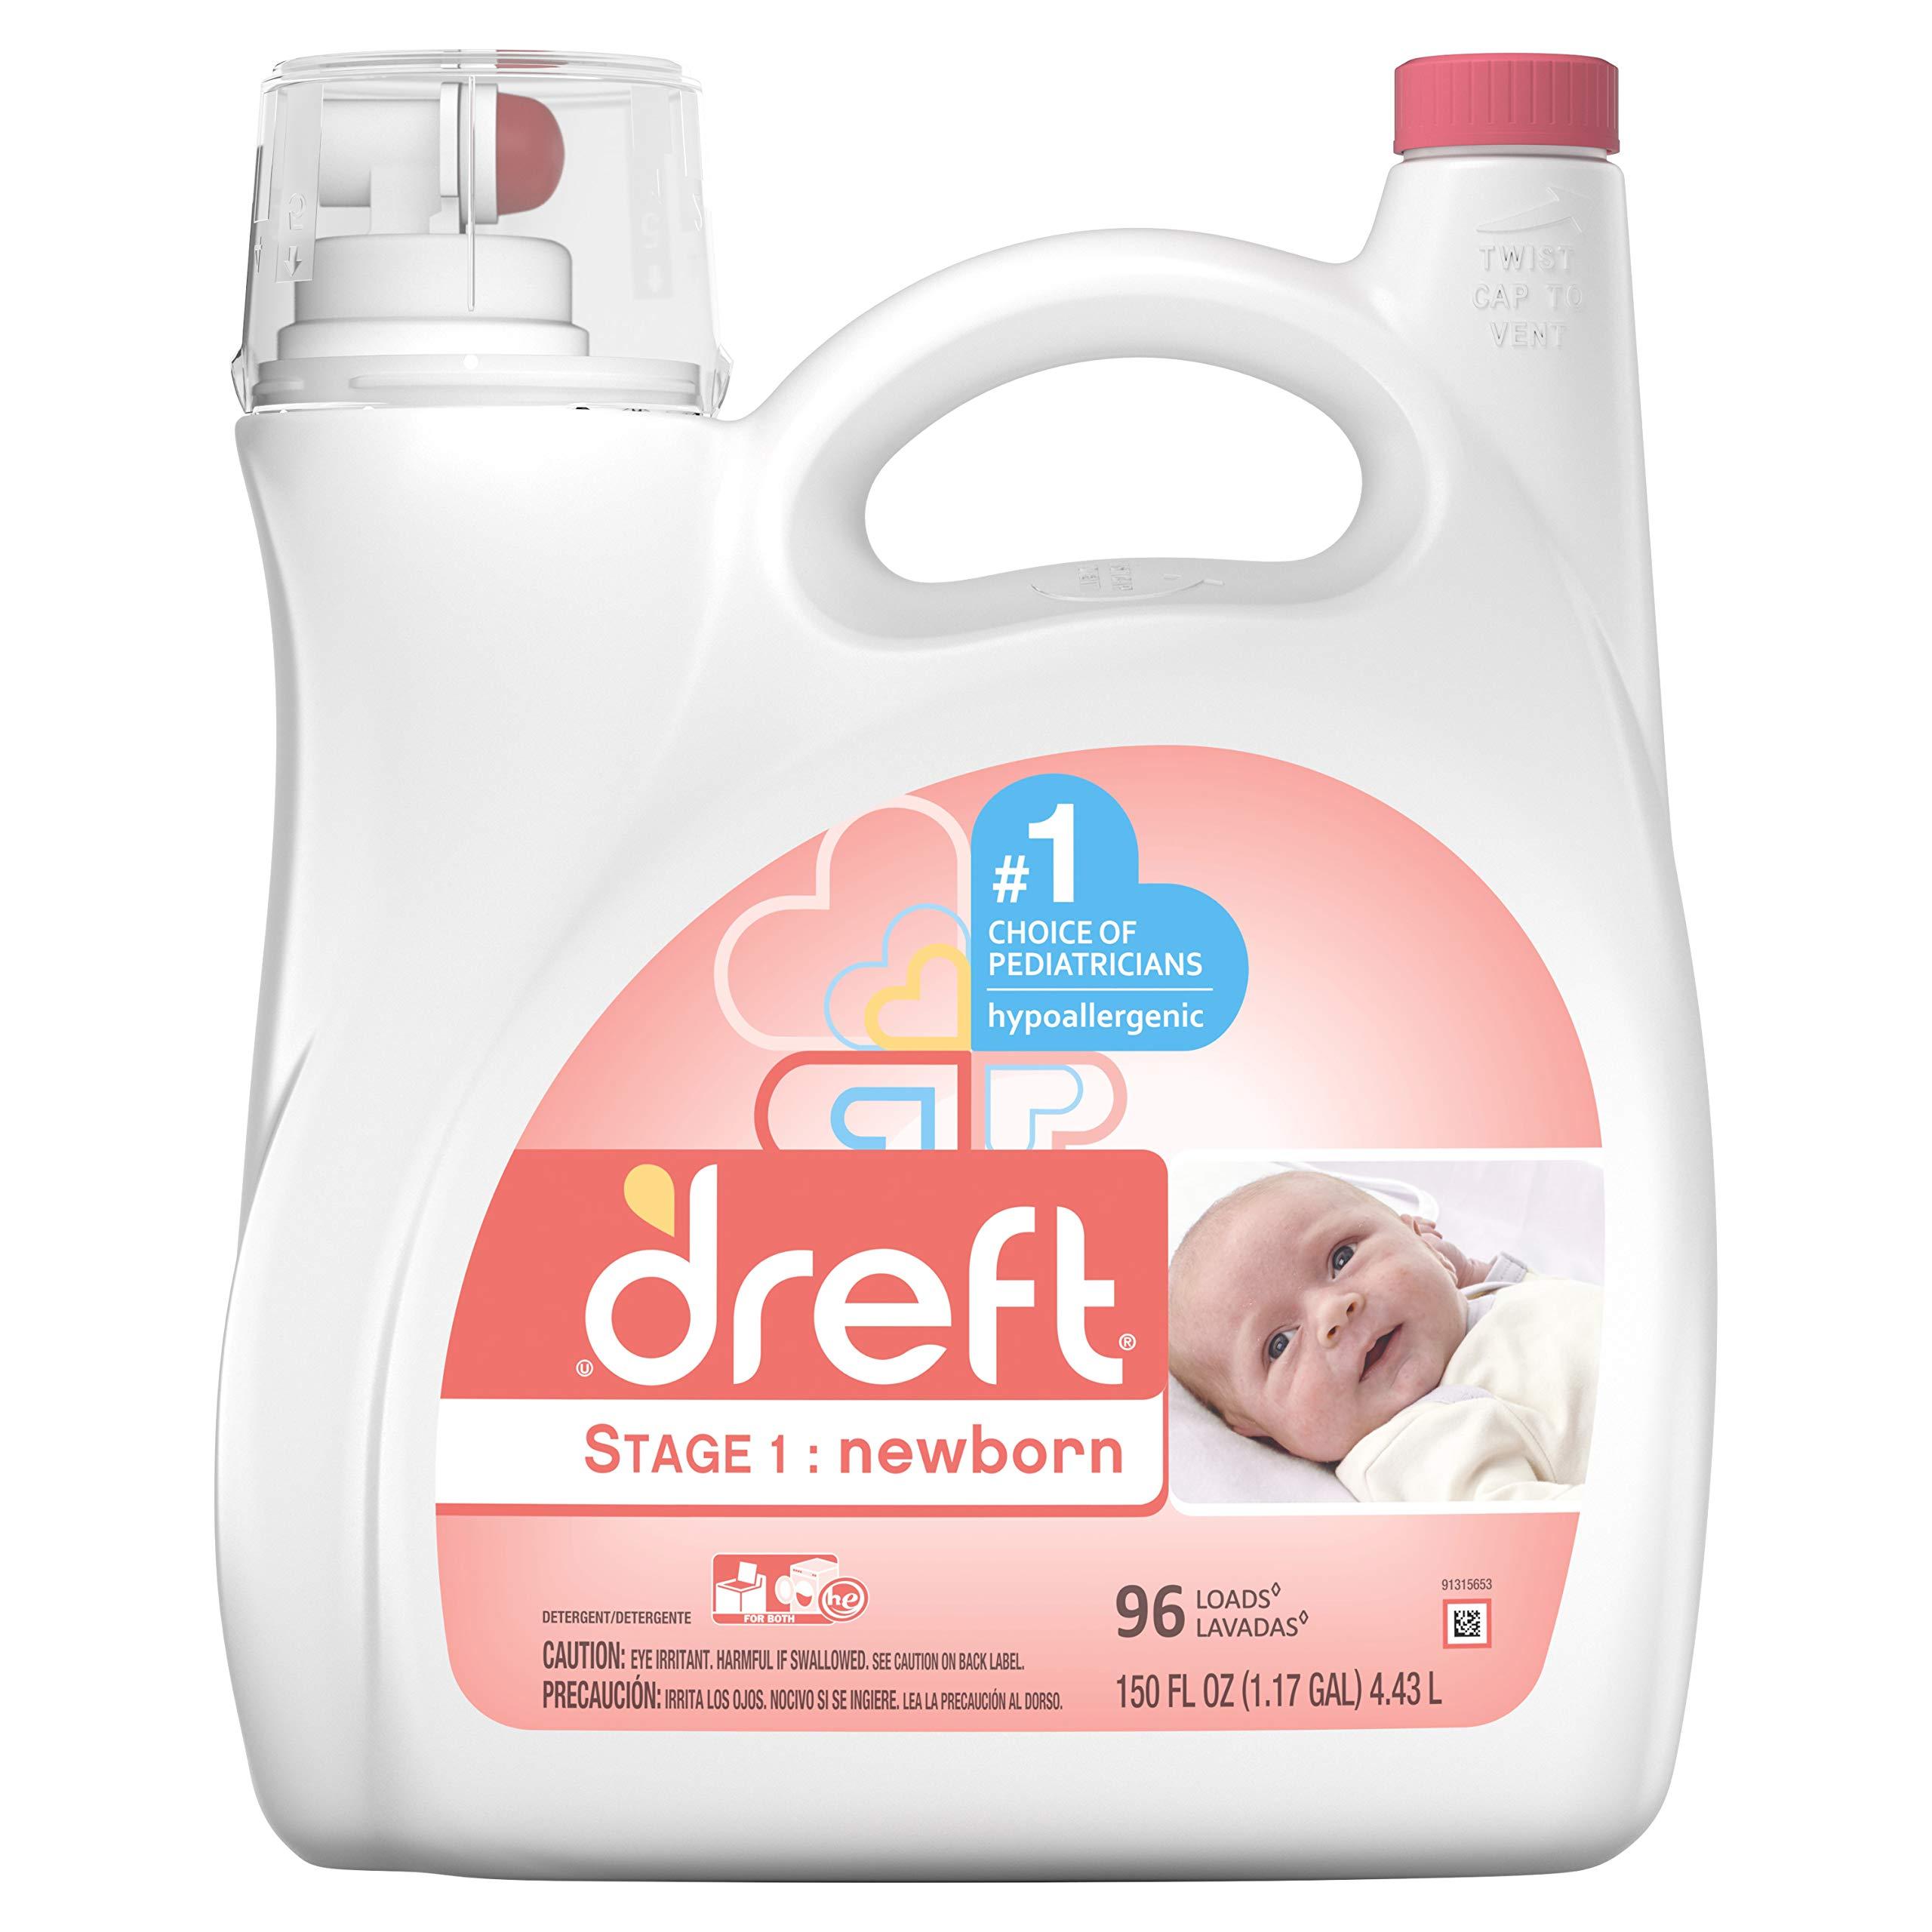 Dreft Stage 1: Newborn Liquid Laundry Detergent (HE), 150 oz, 96 loads by Dreft